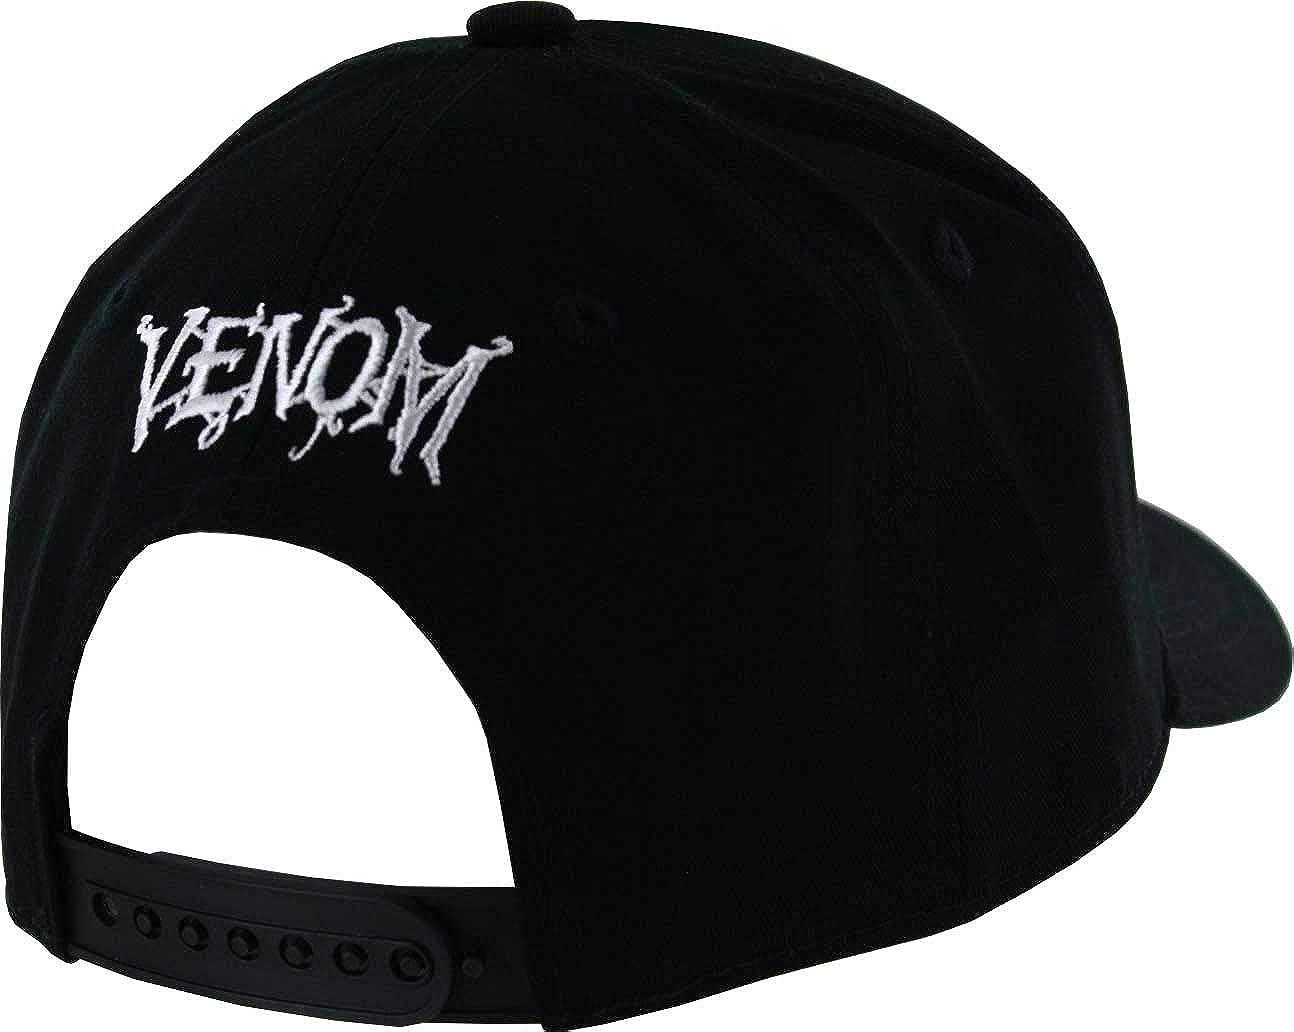 5e6658e3f4947 Amazon.com  Venom Agent Venom Snapback Hat  Clothing